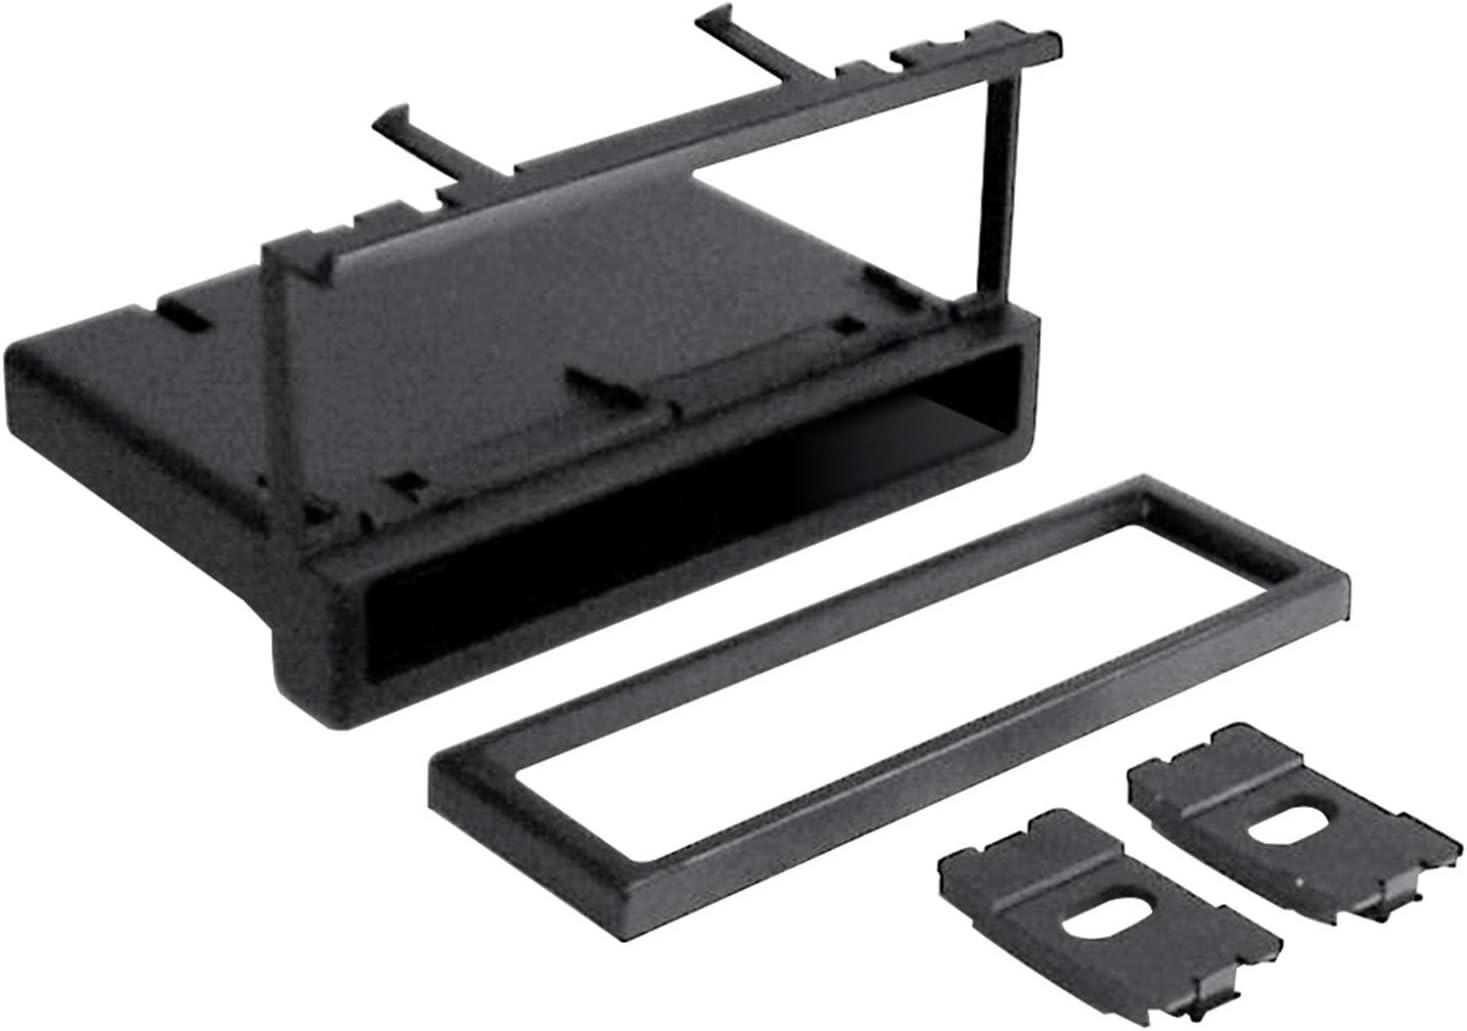 Scosche FD1327B Compatible with 1995-07 Ford / Lincoln / Mercury / Mazda DIN w/Molded Pocket Dash Kit Black